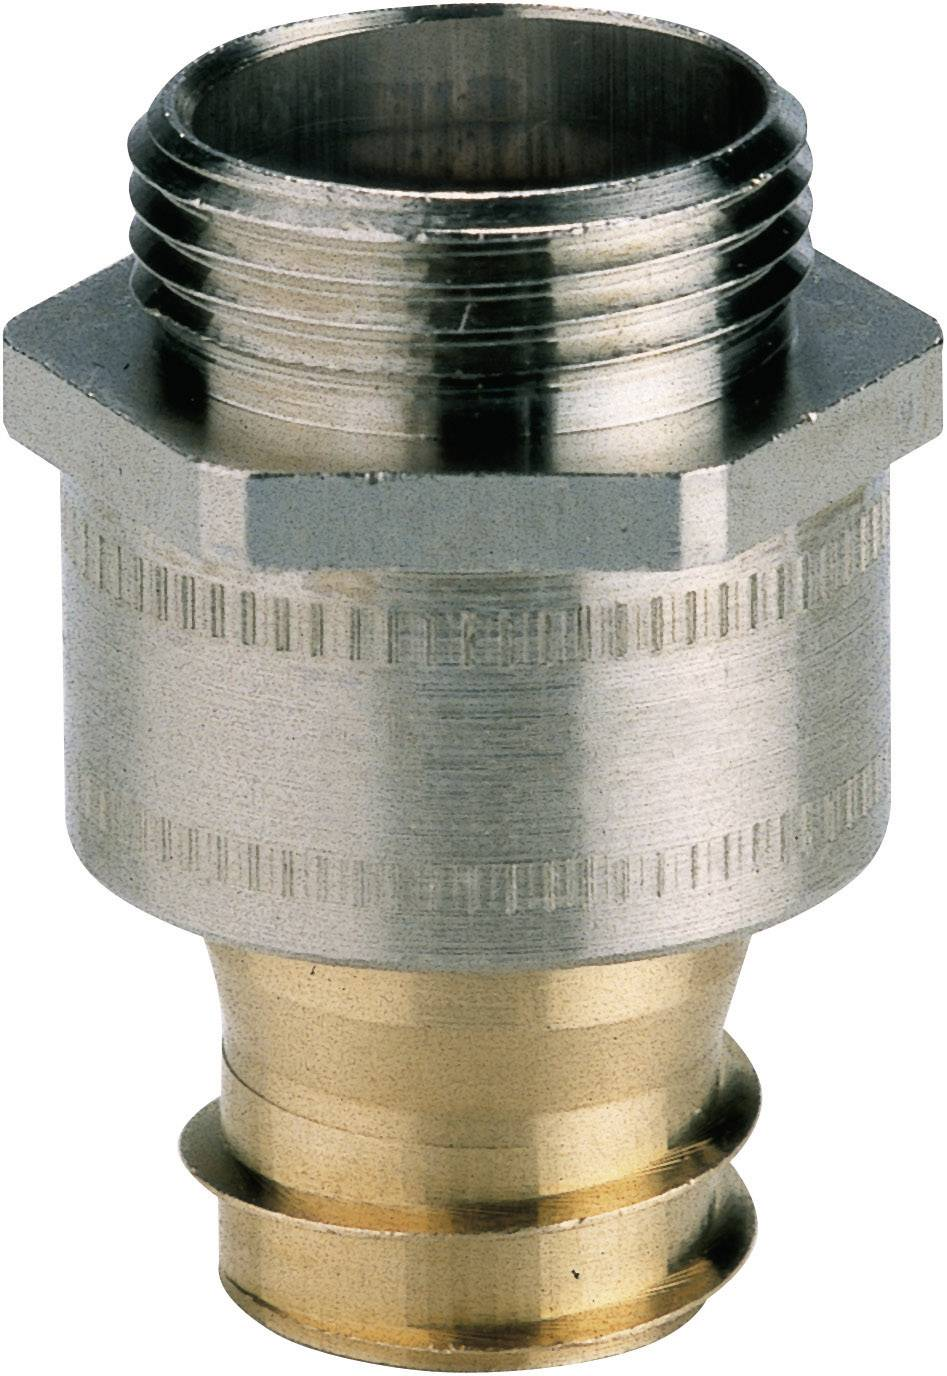 Hadicová spojka rovná LAPP SILVYN® LI-M 25x1,5 SGY 61802373, M25, stříbrná, 1 ks